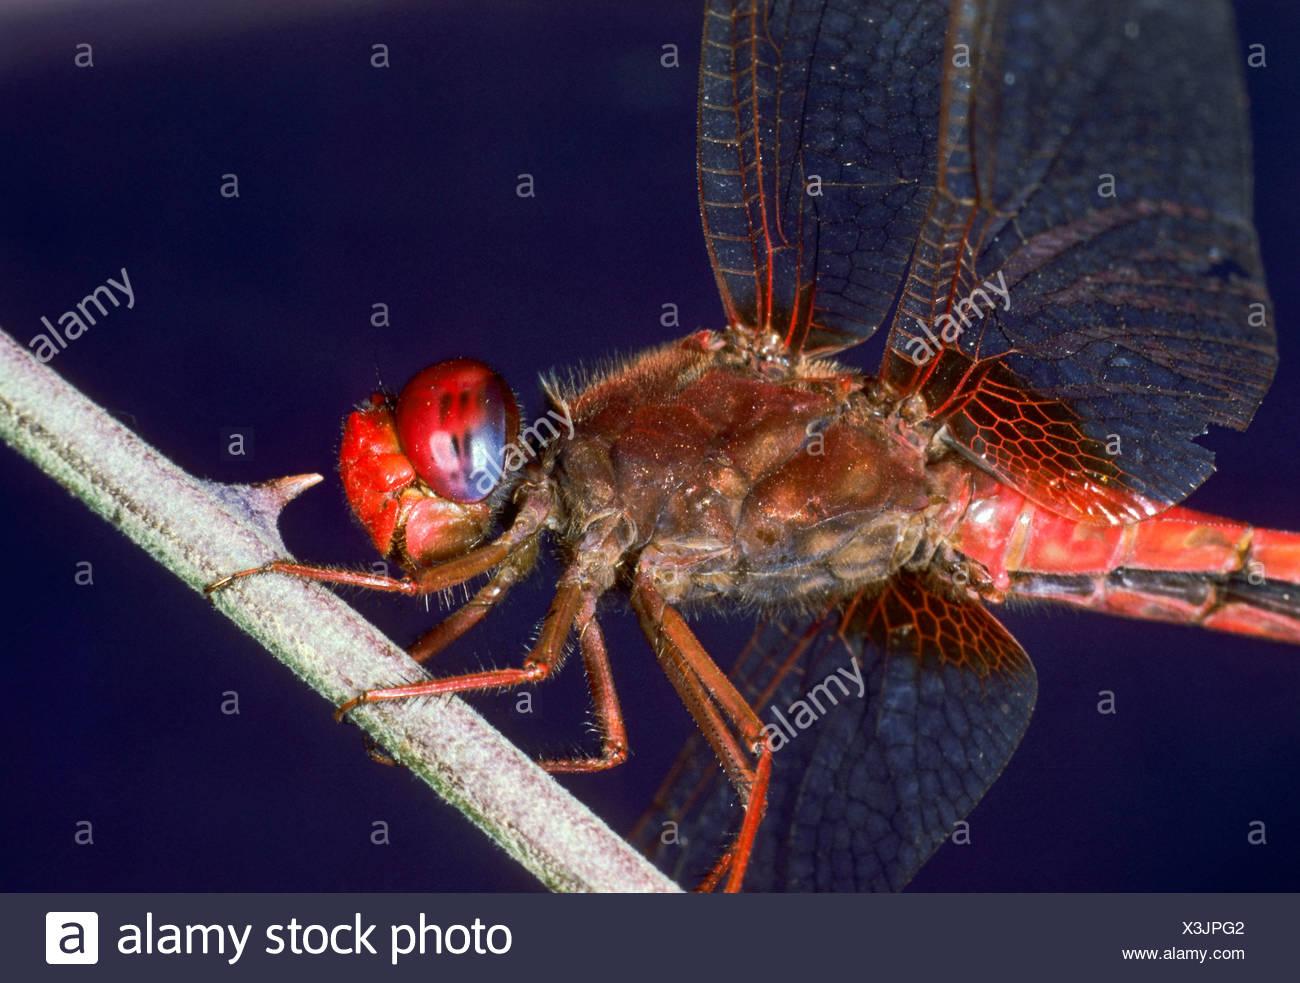 Broad Scarlet, Common Scarlet-darter, Scarlet Darter, Scarlet Dragonfly (Crocothemis erythraea, Croccothemis erythraea), male sitting at a stem, Germany Stock Photo